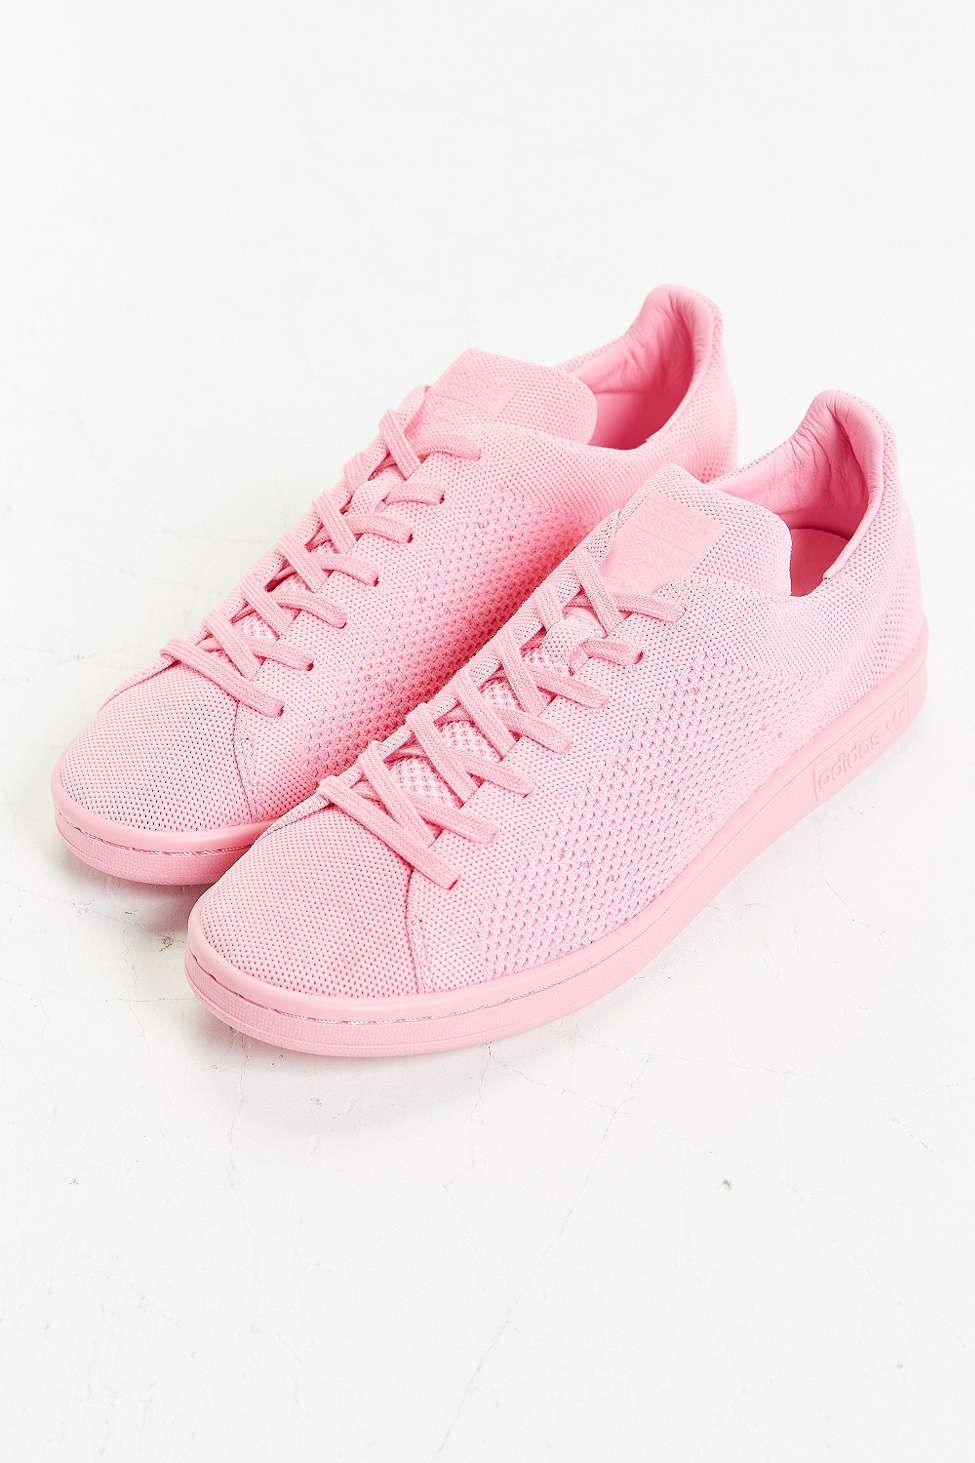 Adidas stan smith primeknit scarpe pinterest scarpe adidas